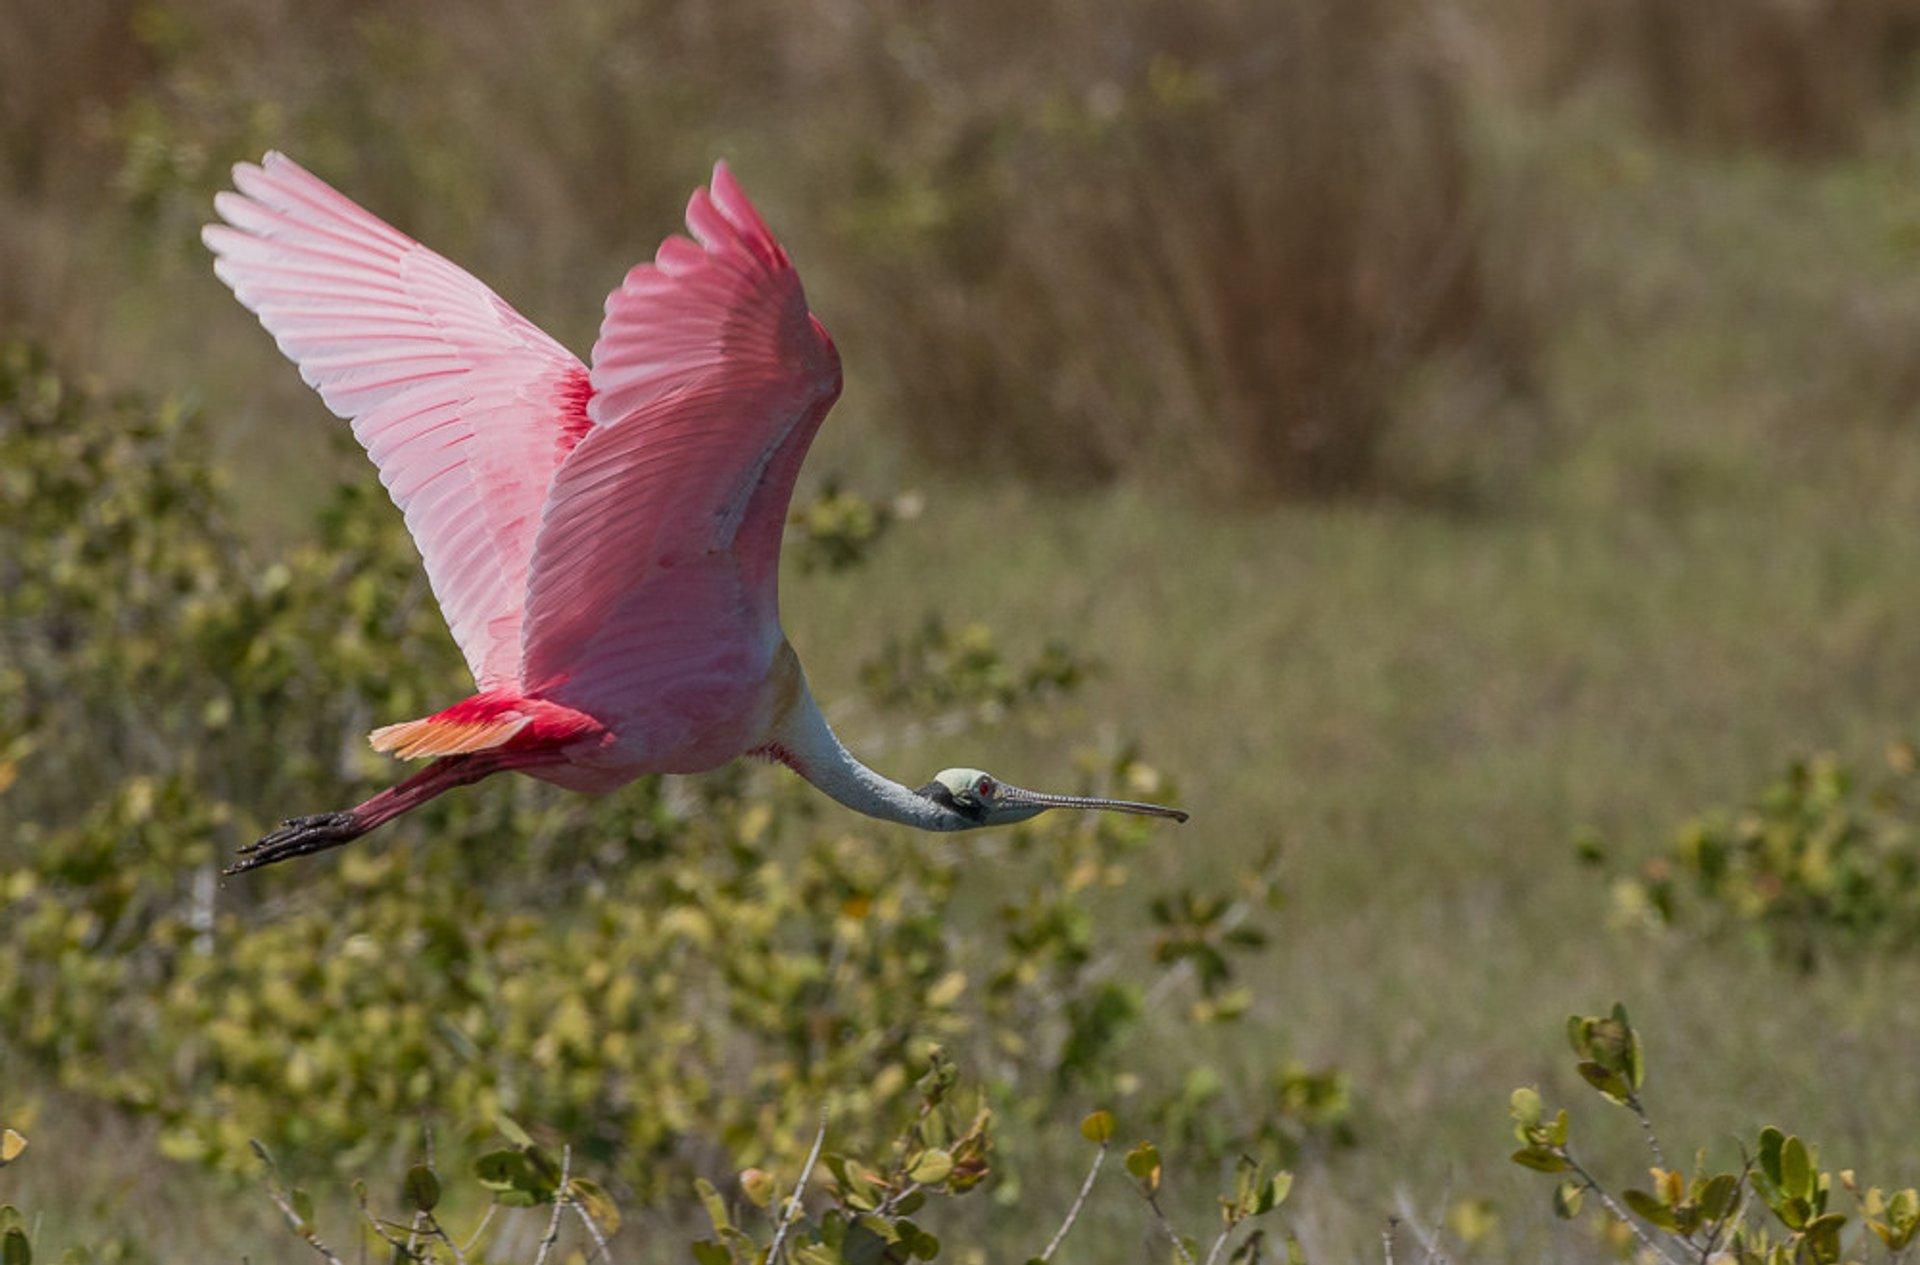 Birdwatching  in Florida 2020 - Best Time